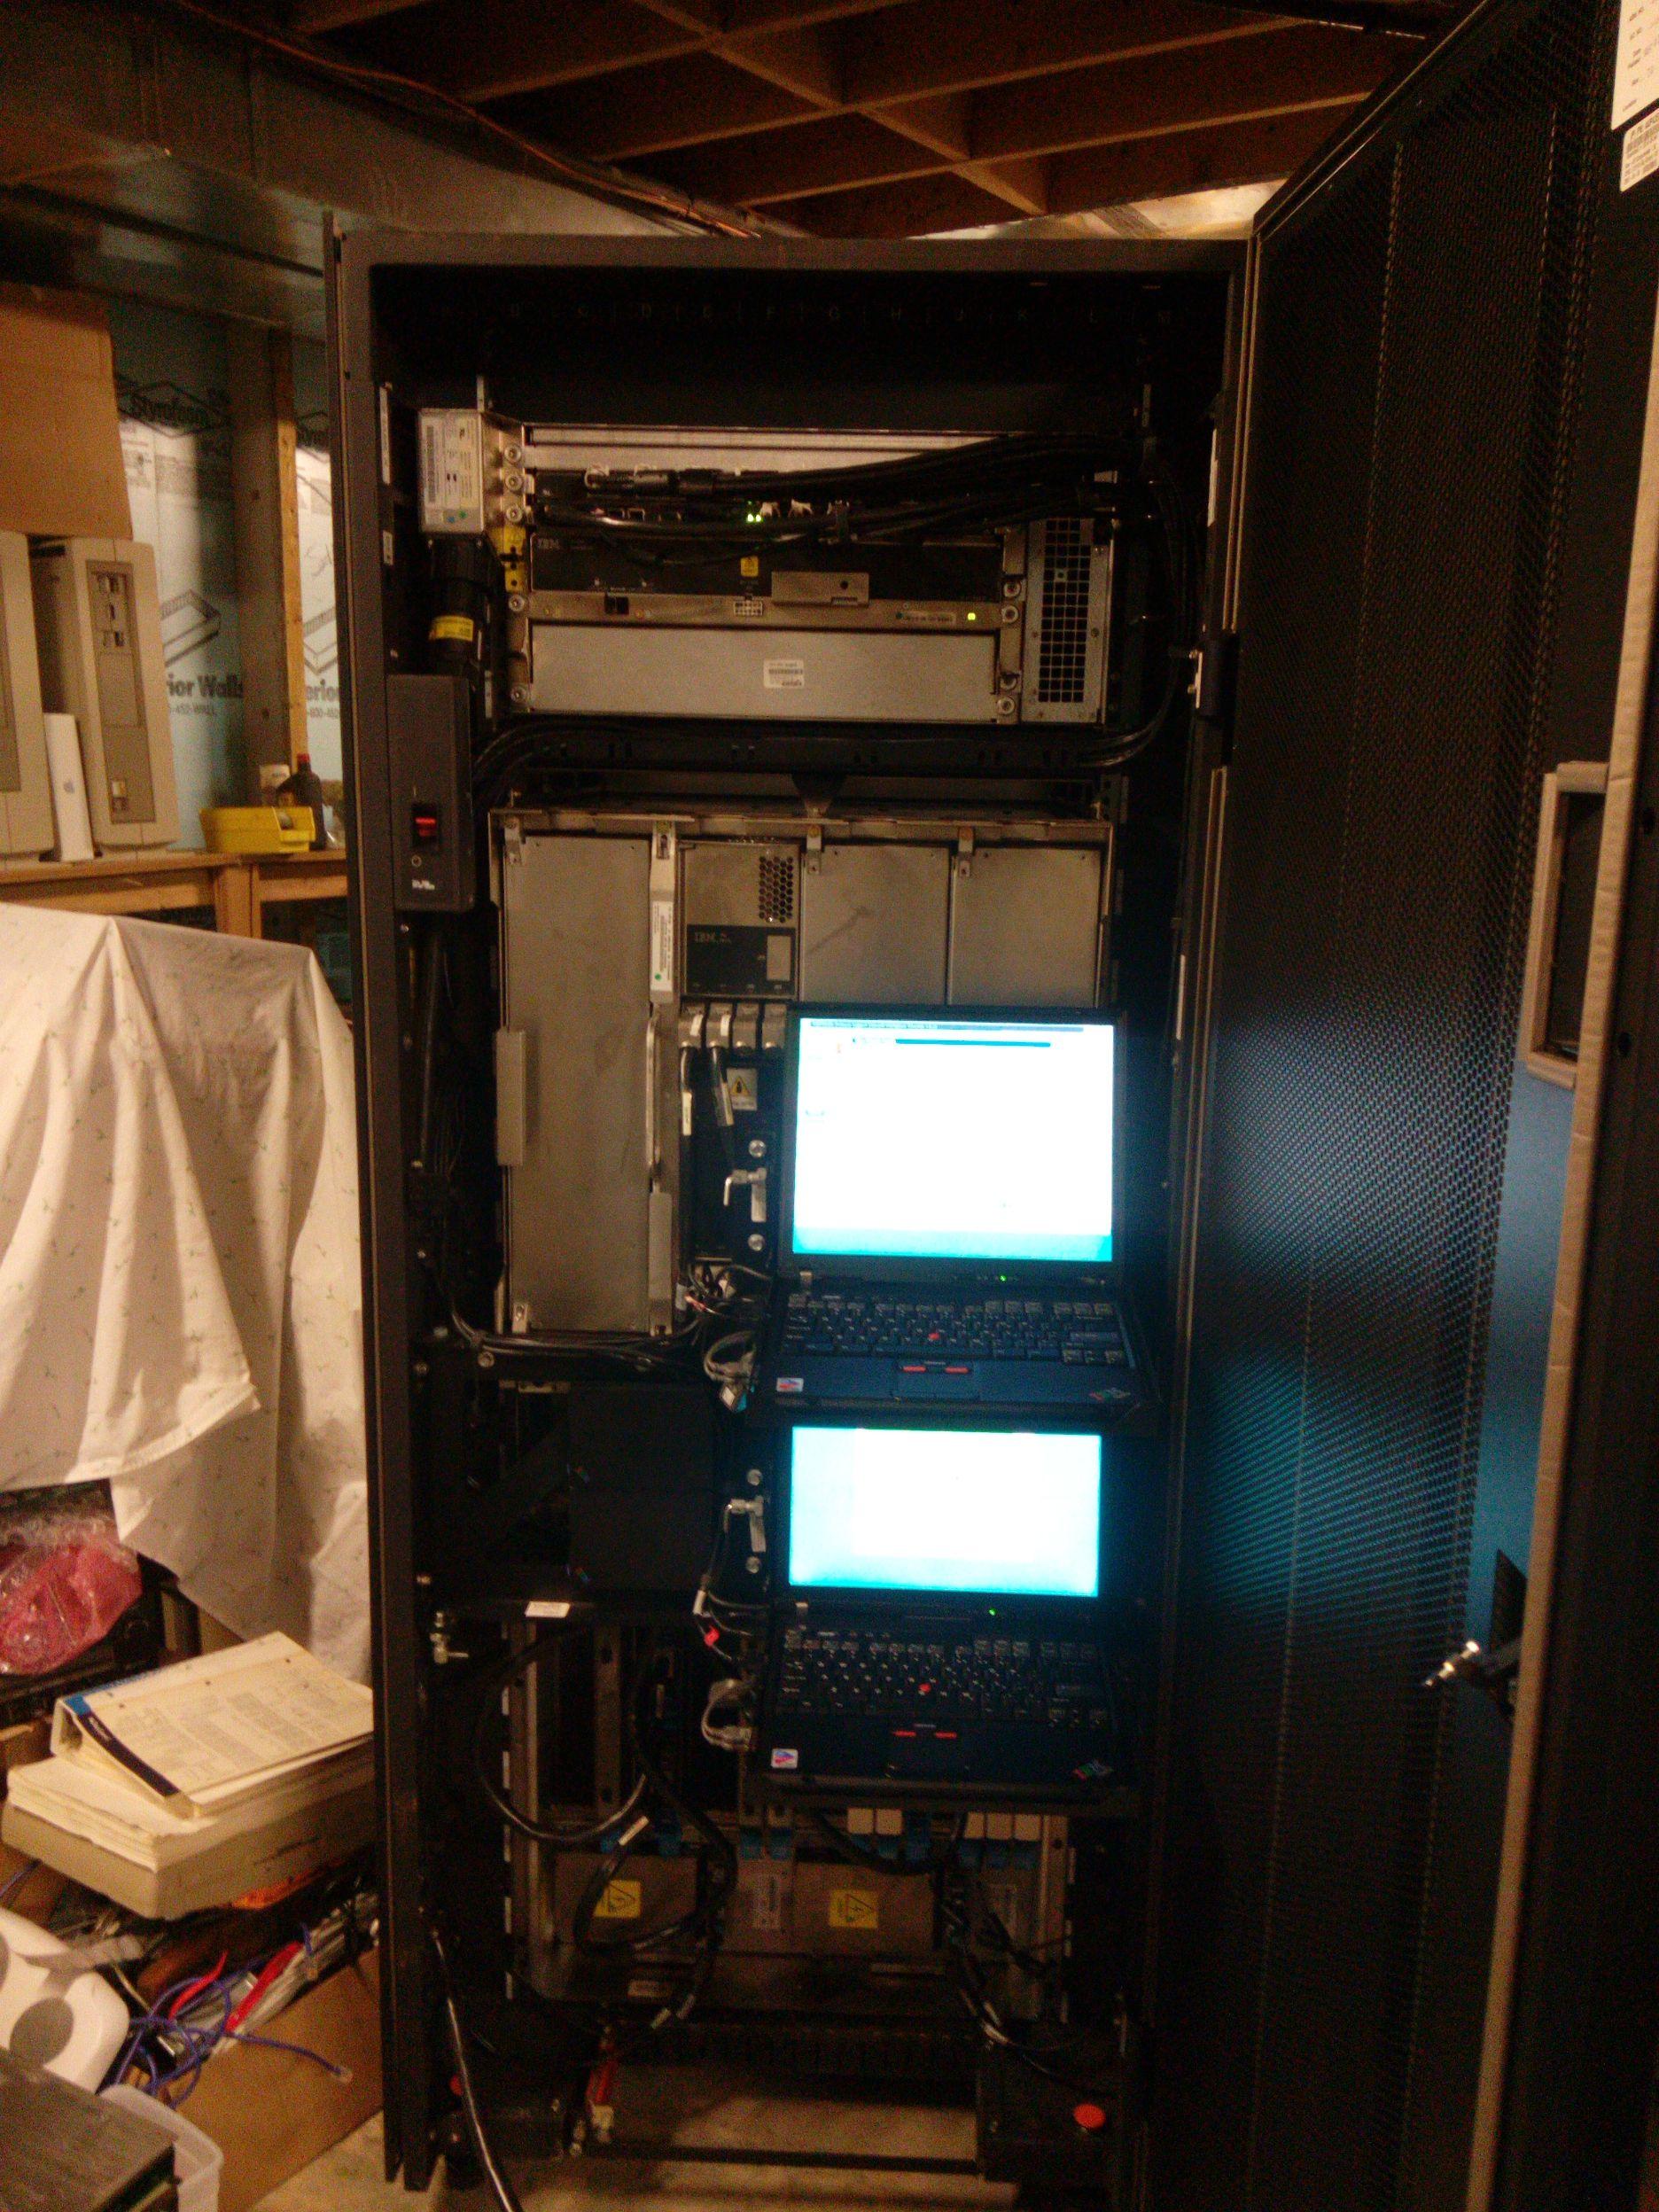 18-летний энтузиаст купил и установил в подвале мейнфрейм IBM z890 (2004 год) - 16